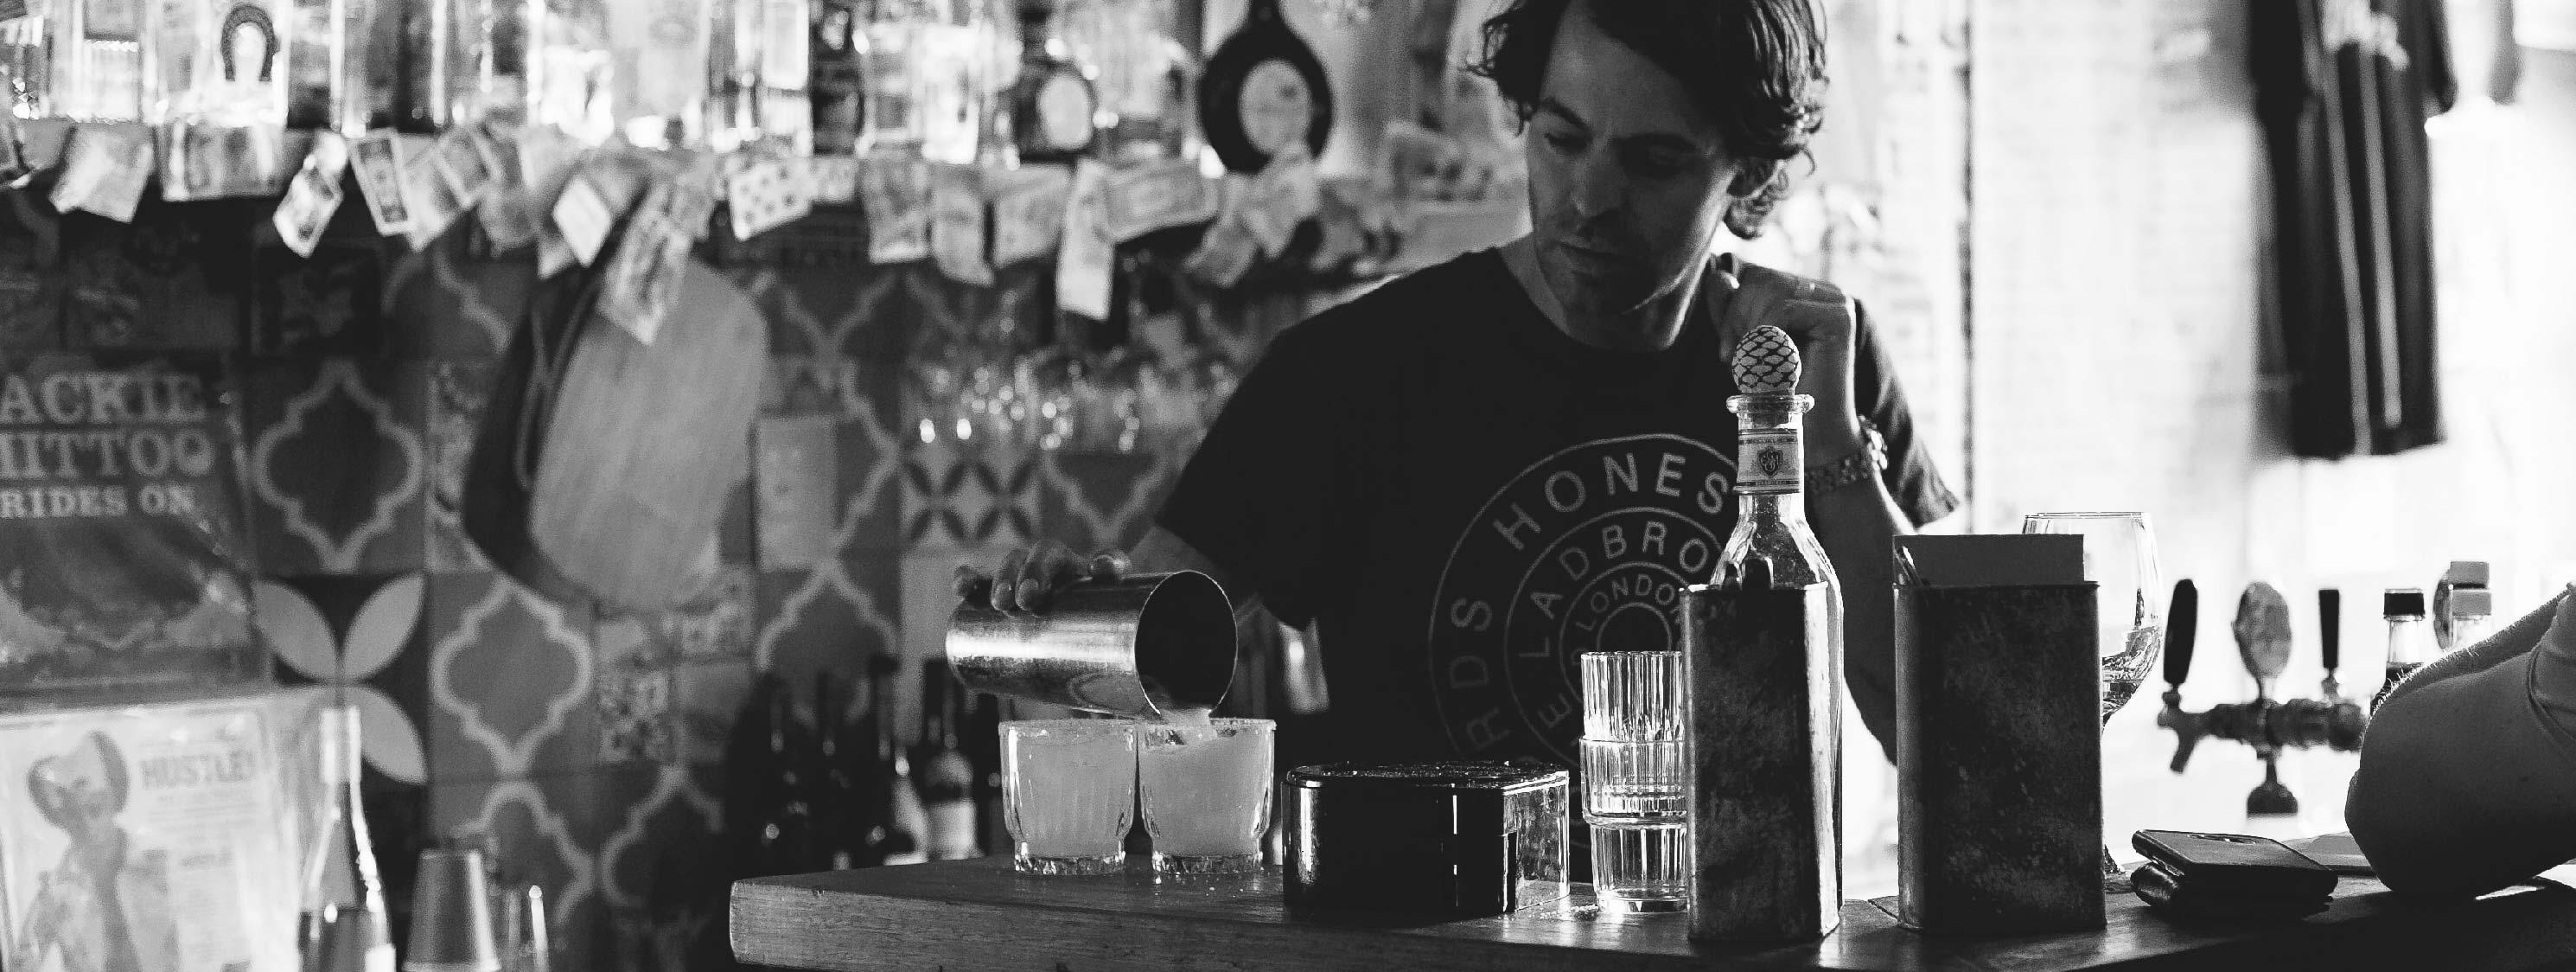 Little Hop bar in Melbourne, Australia